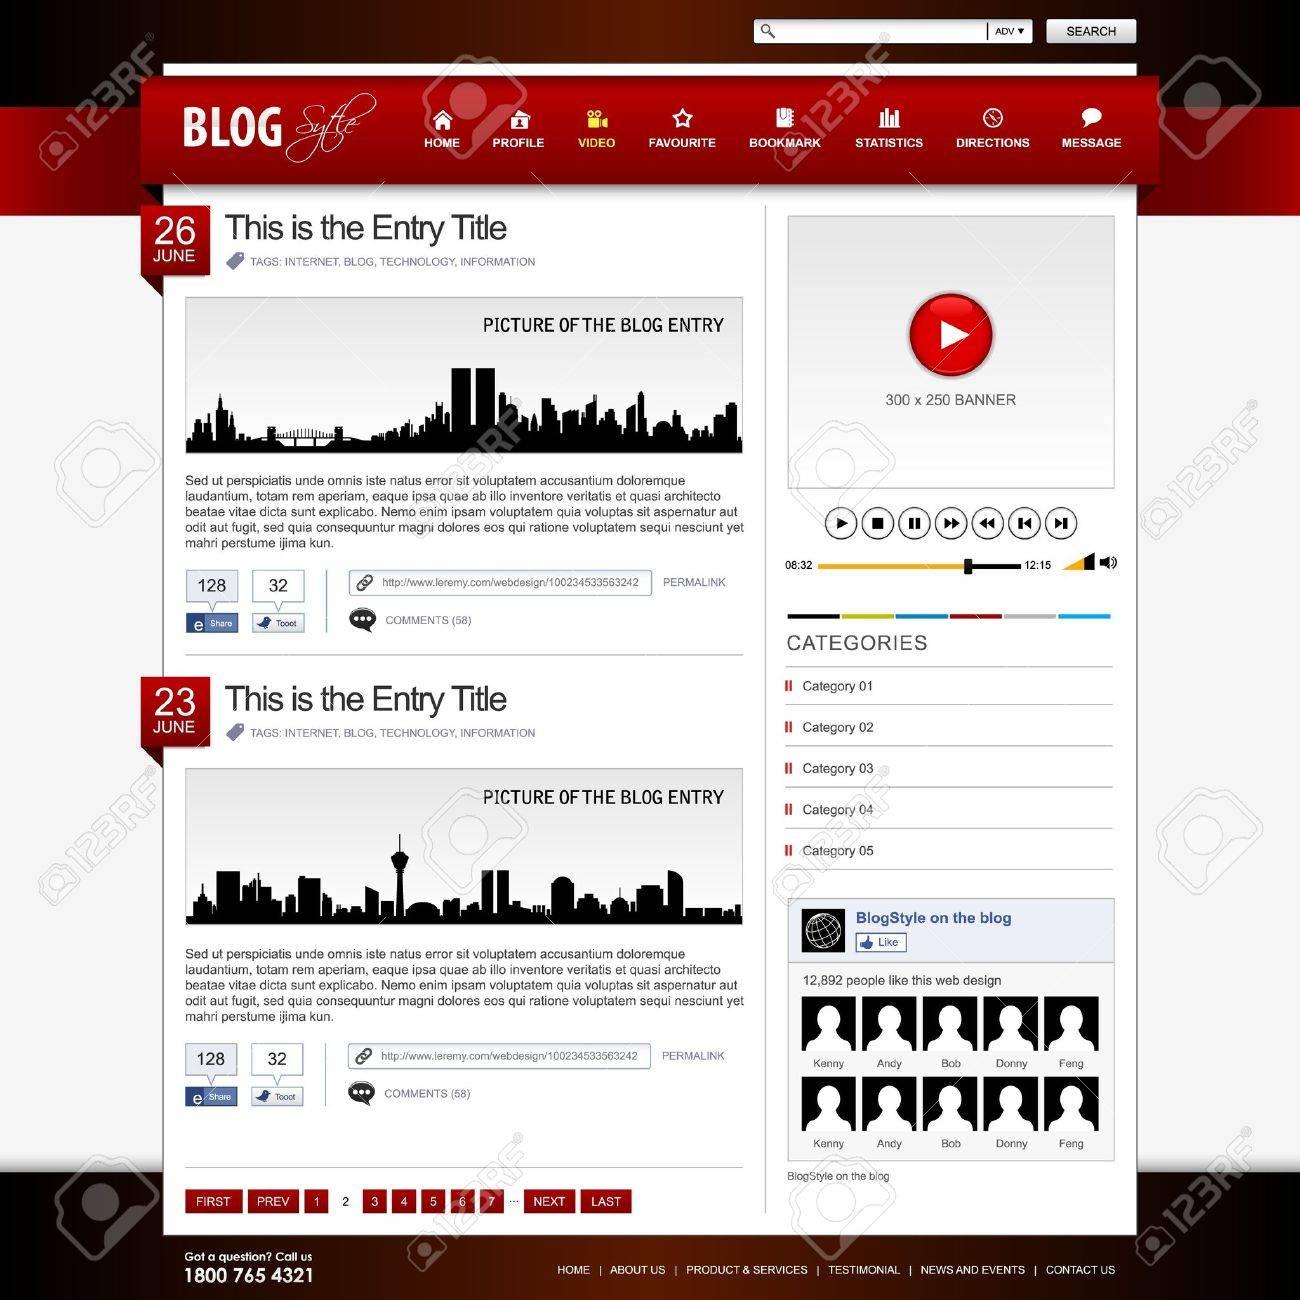 Web Design Website Element Red Template Stock Vector - 18812298